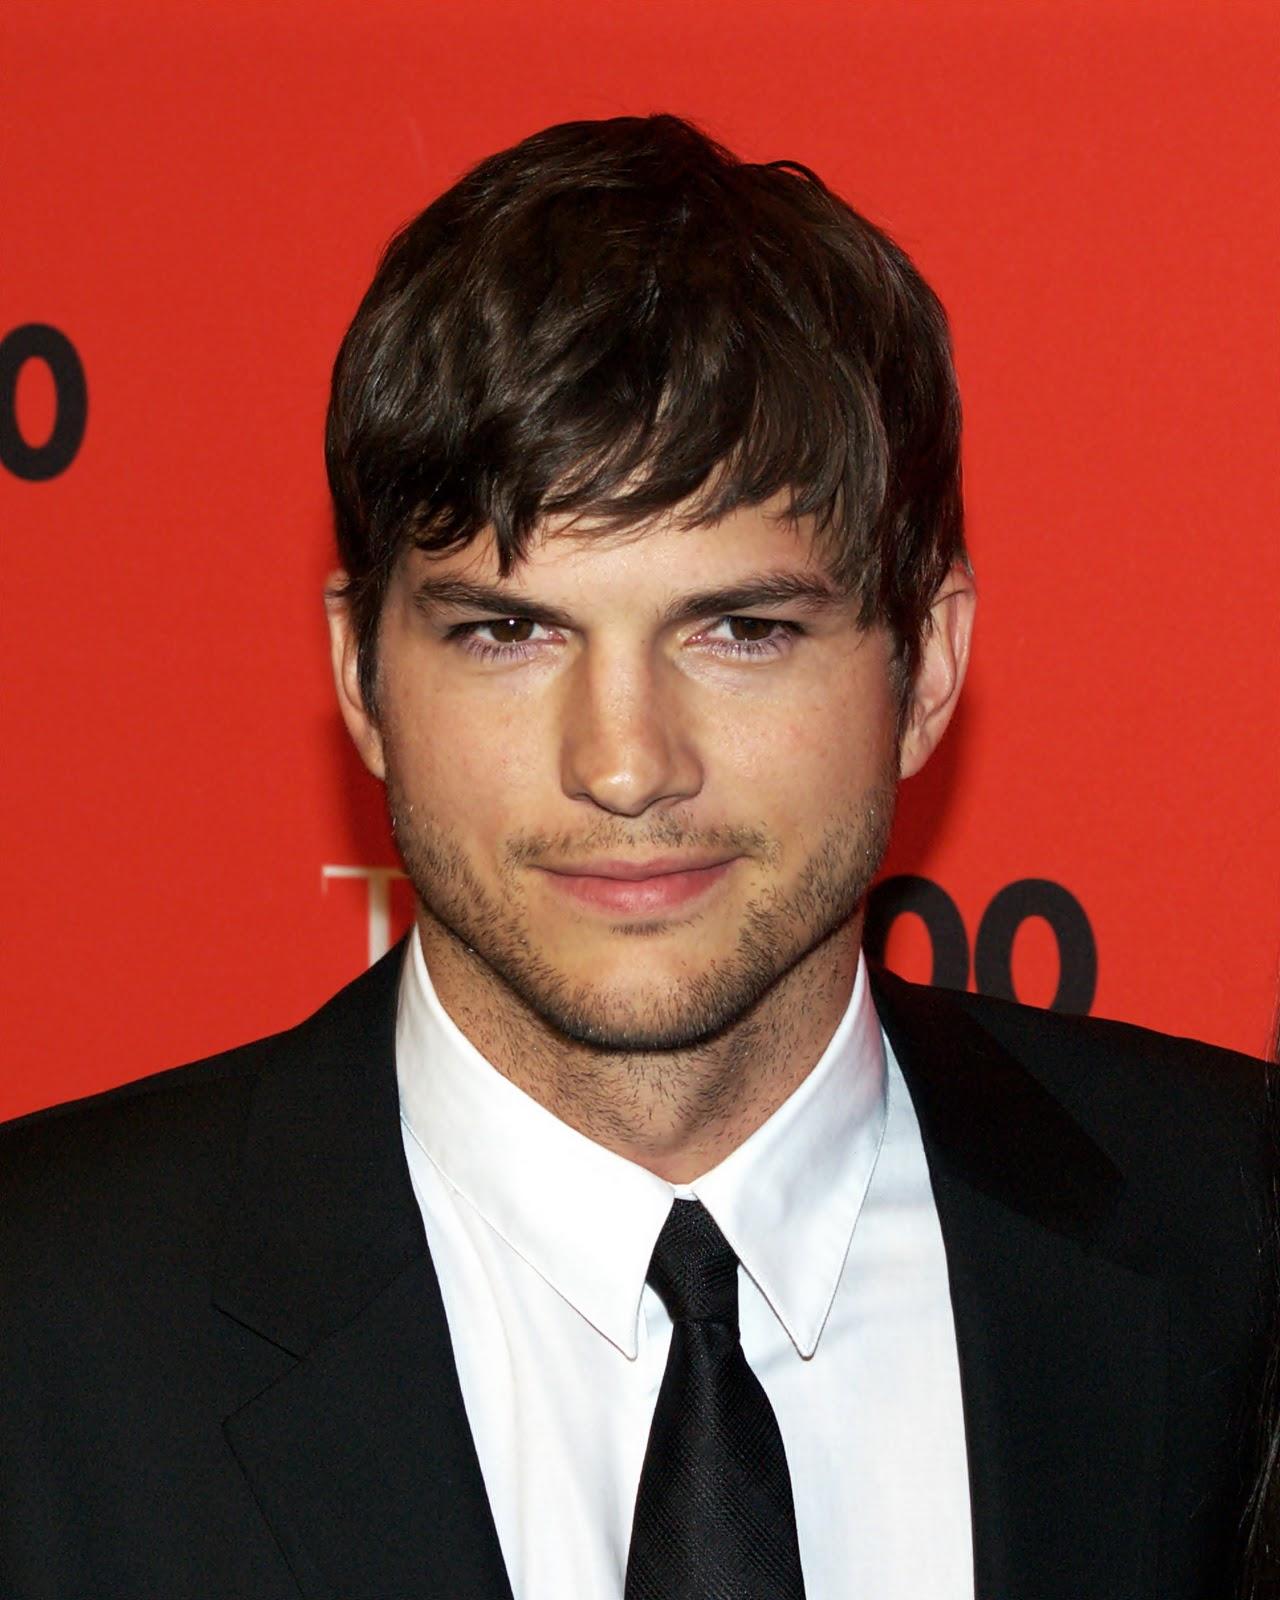 http://4.bp.blogspot.com/-FfKIccpZOys/TyJQtln3G9I/AAAAAAAAA4M/maG2cct3ztA/s1600/Ashton+Kutcher+Pictures.jpg